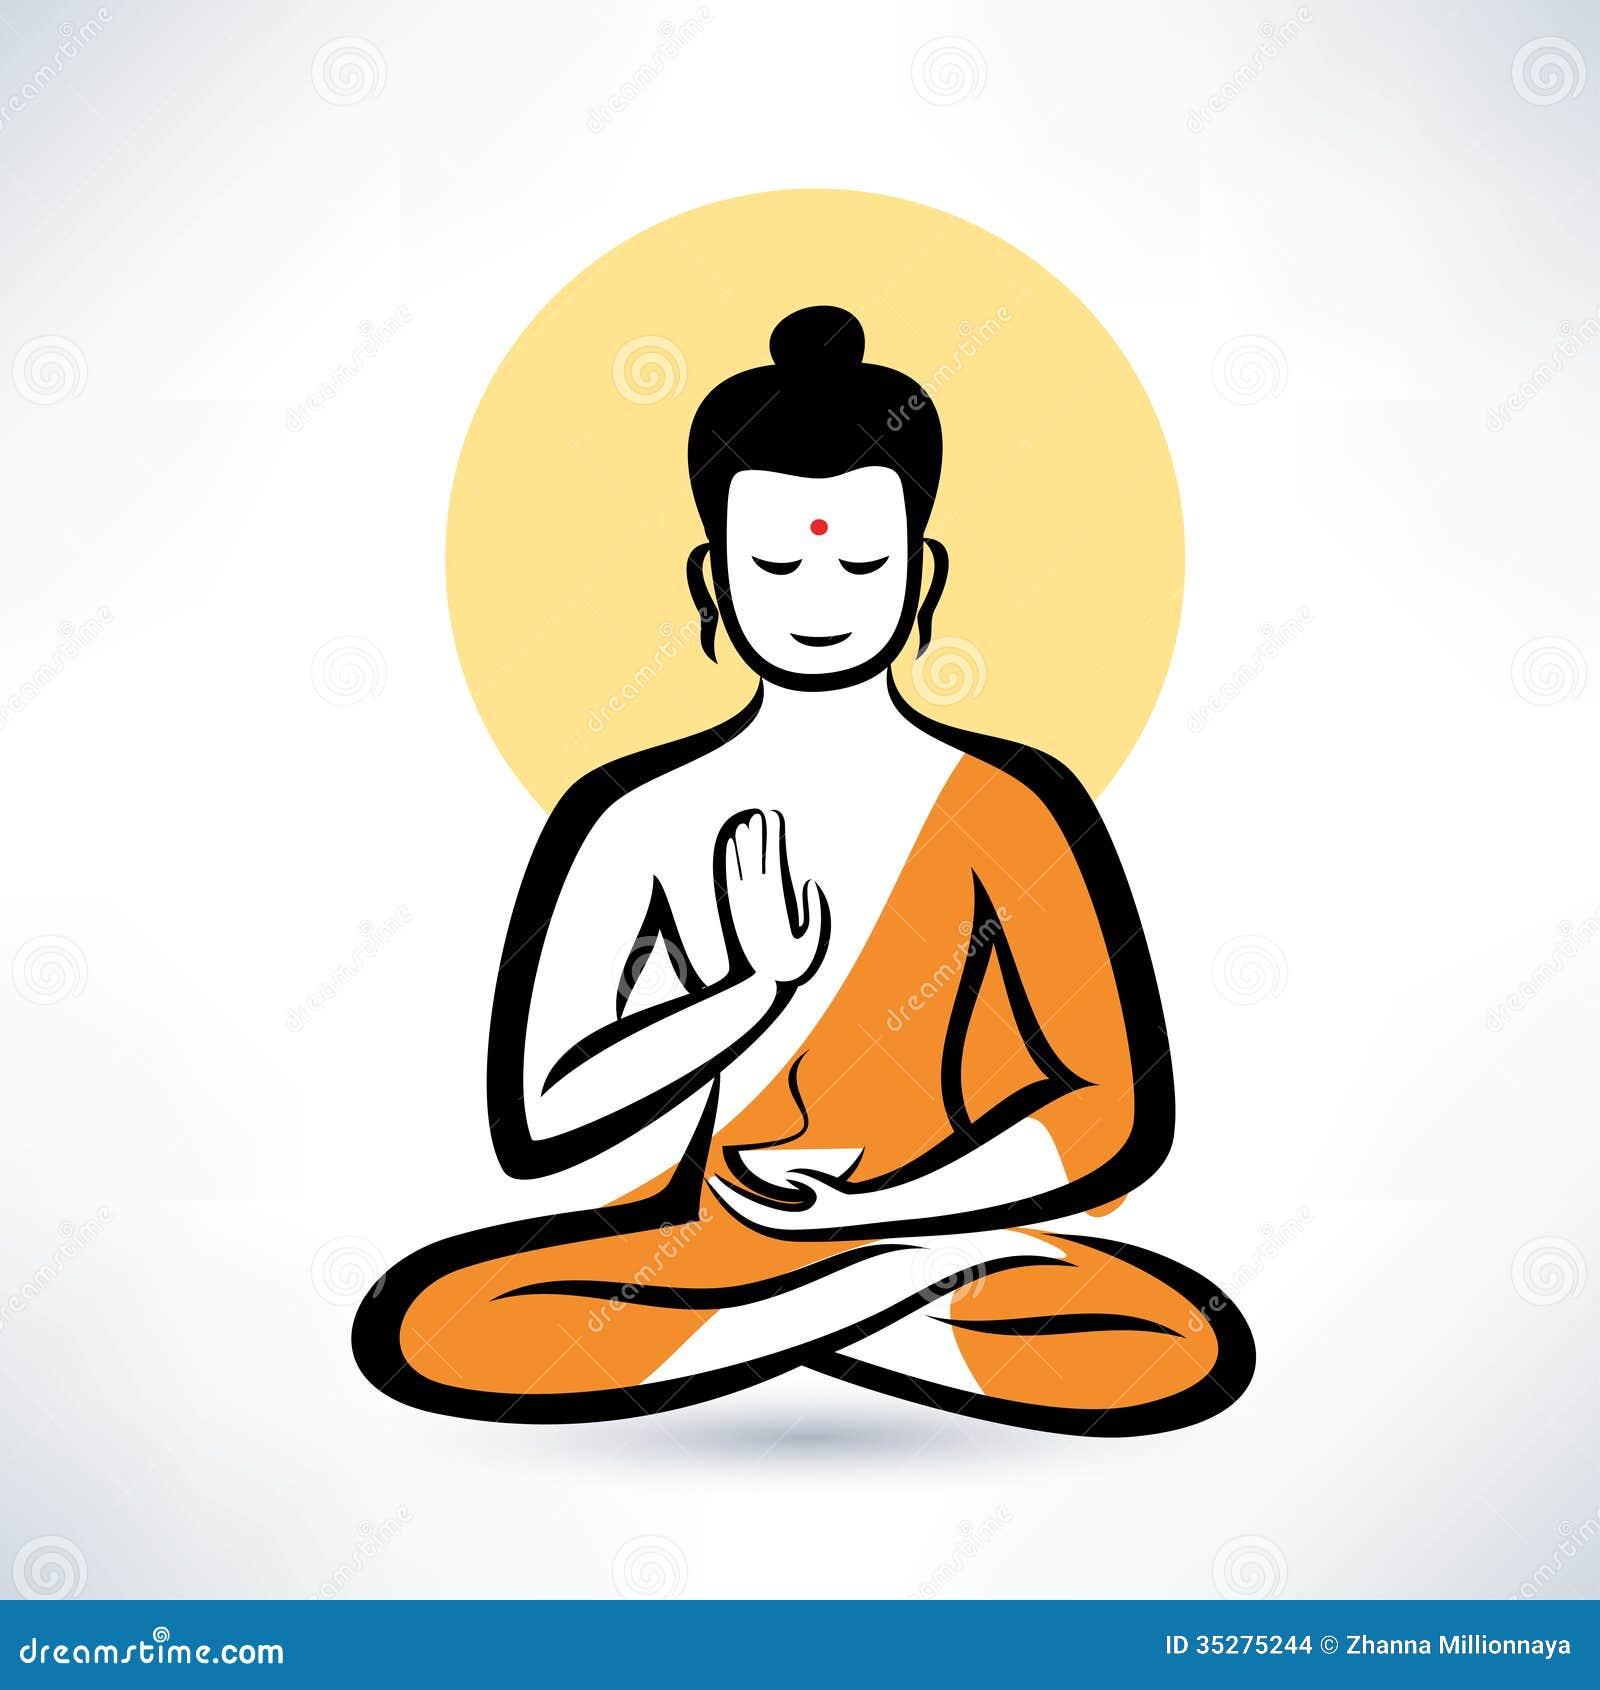 Buddha symbol stock vector illustration of serene peace 35275244 buddha symbol biocorpaavc